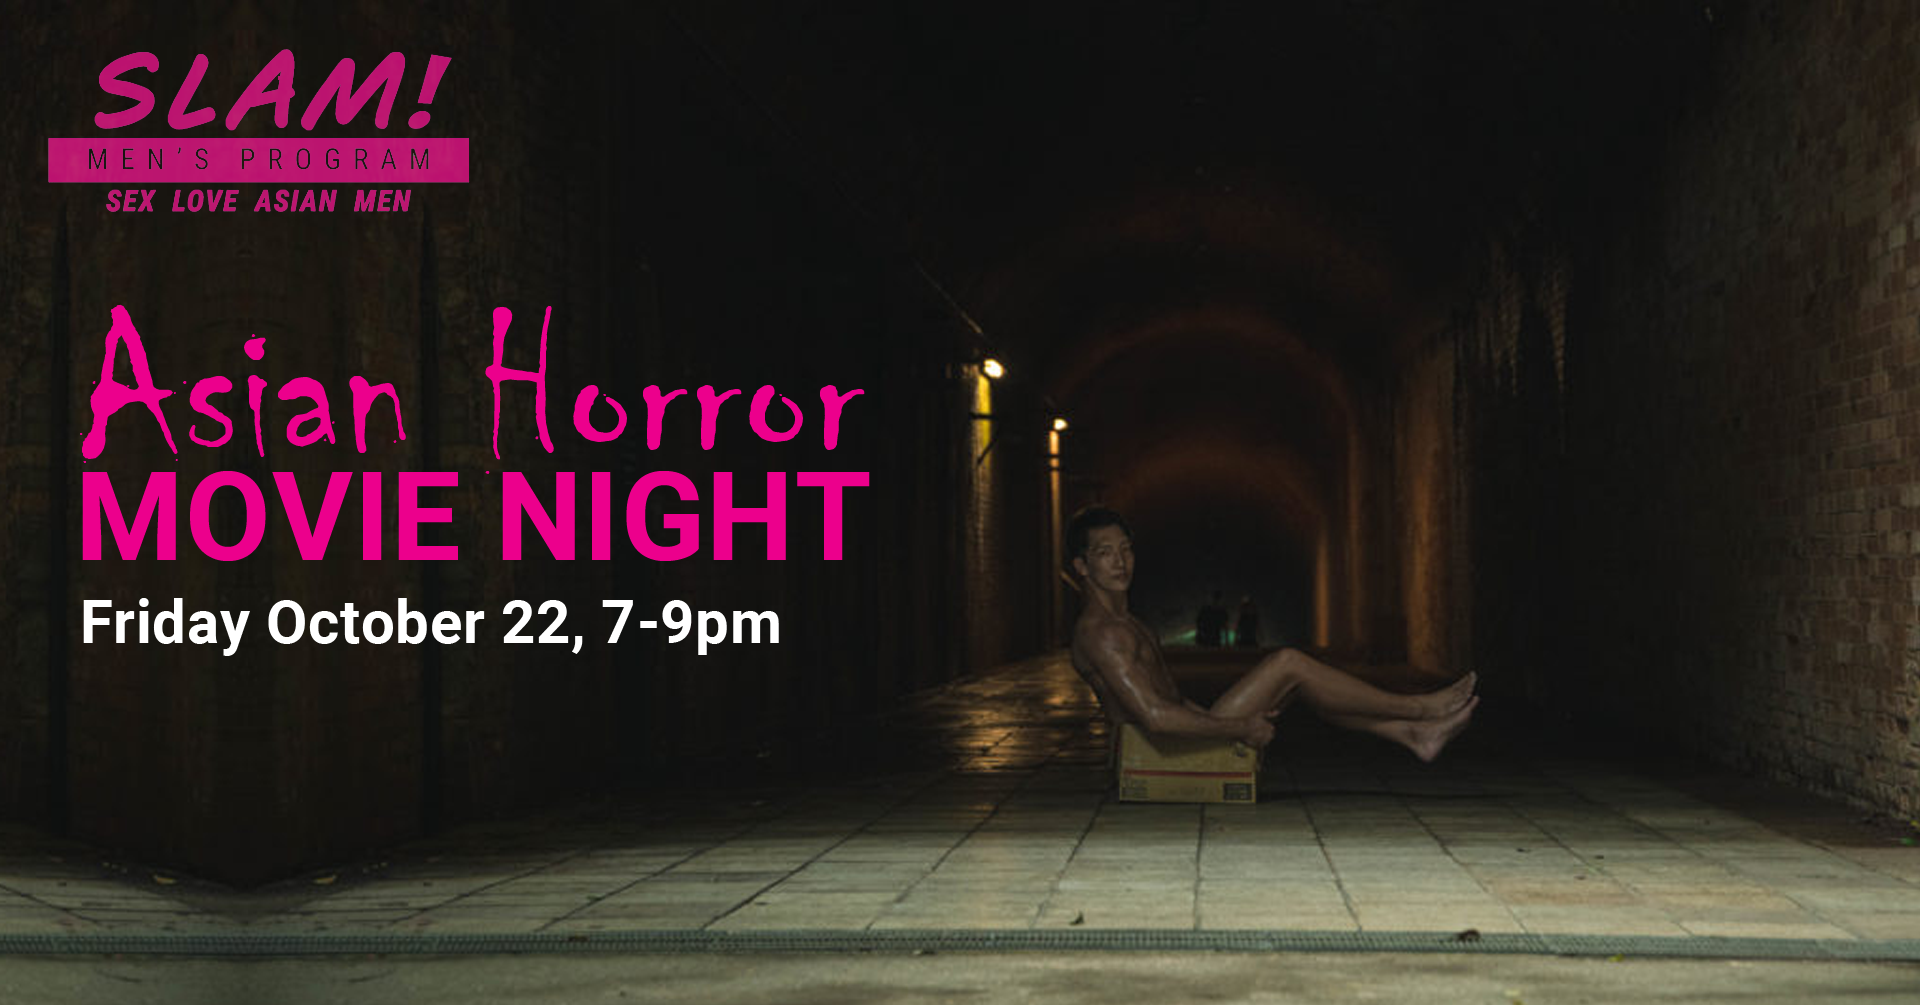 asian horror movie night poster